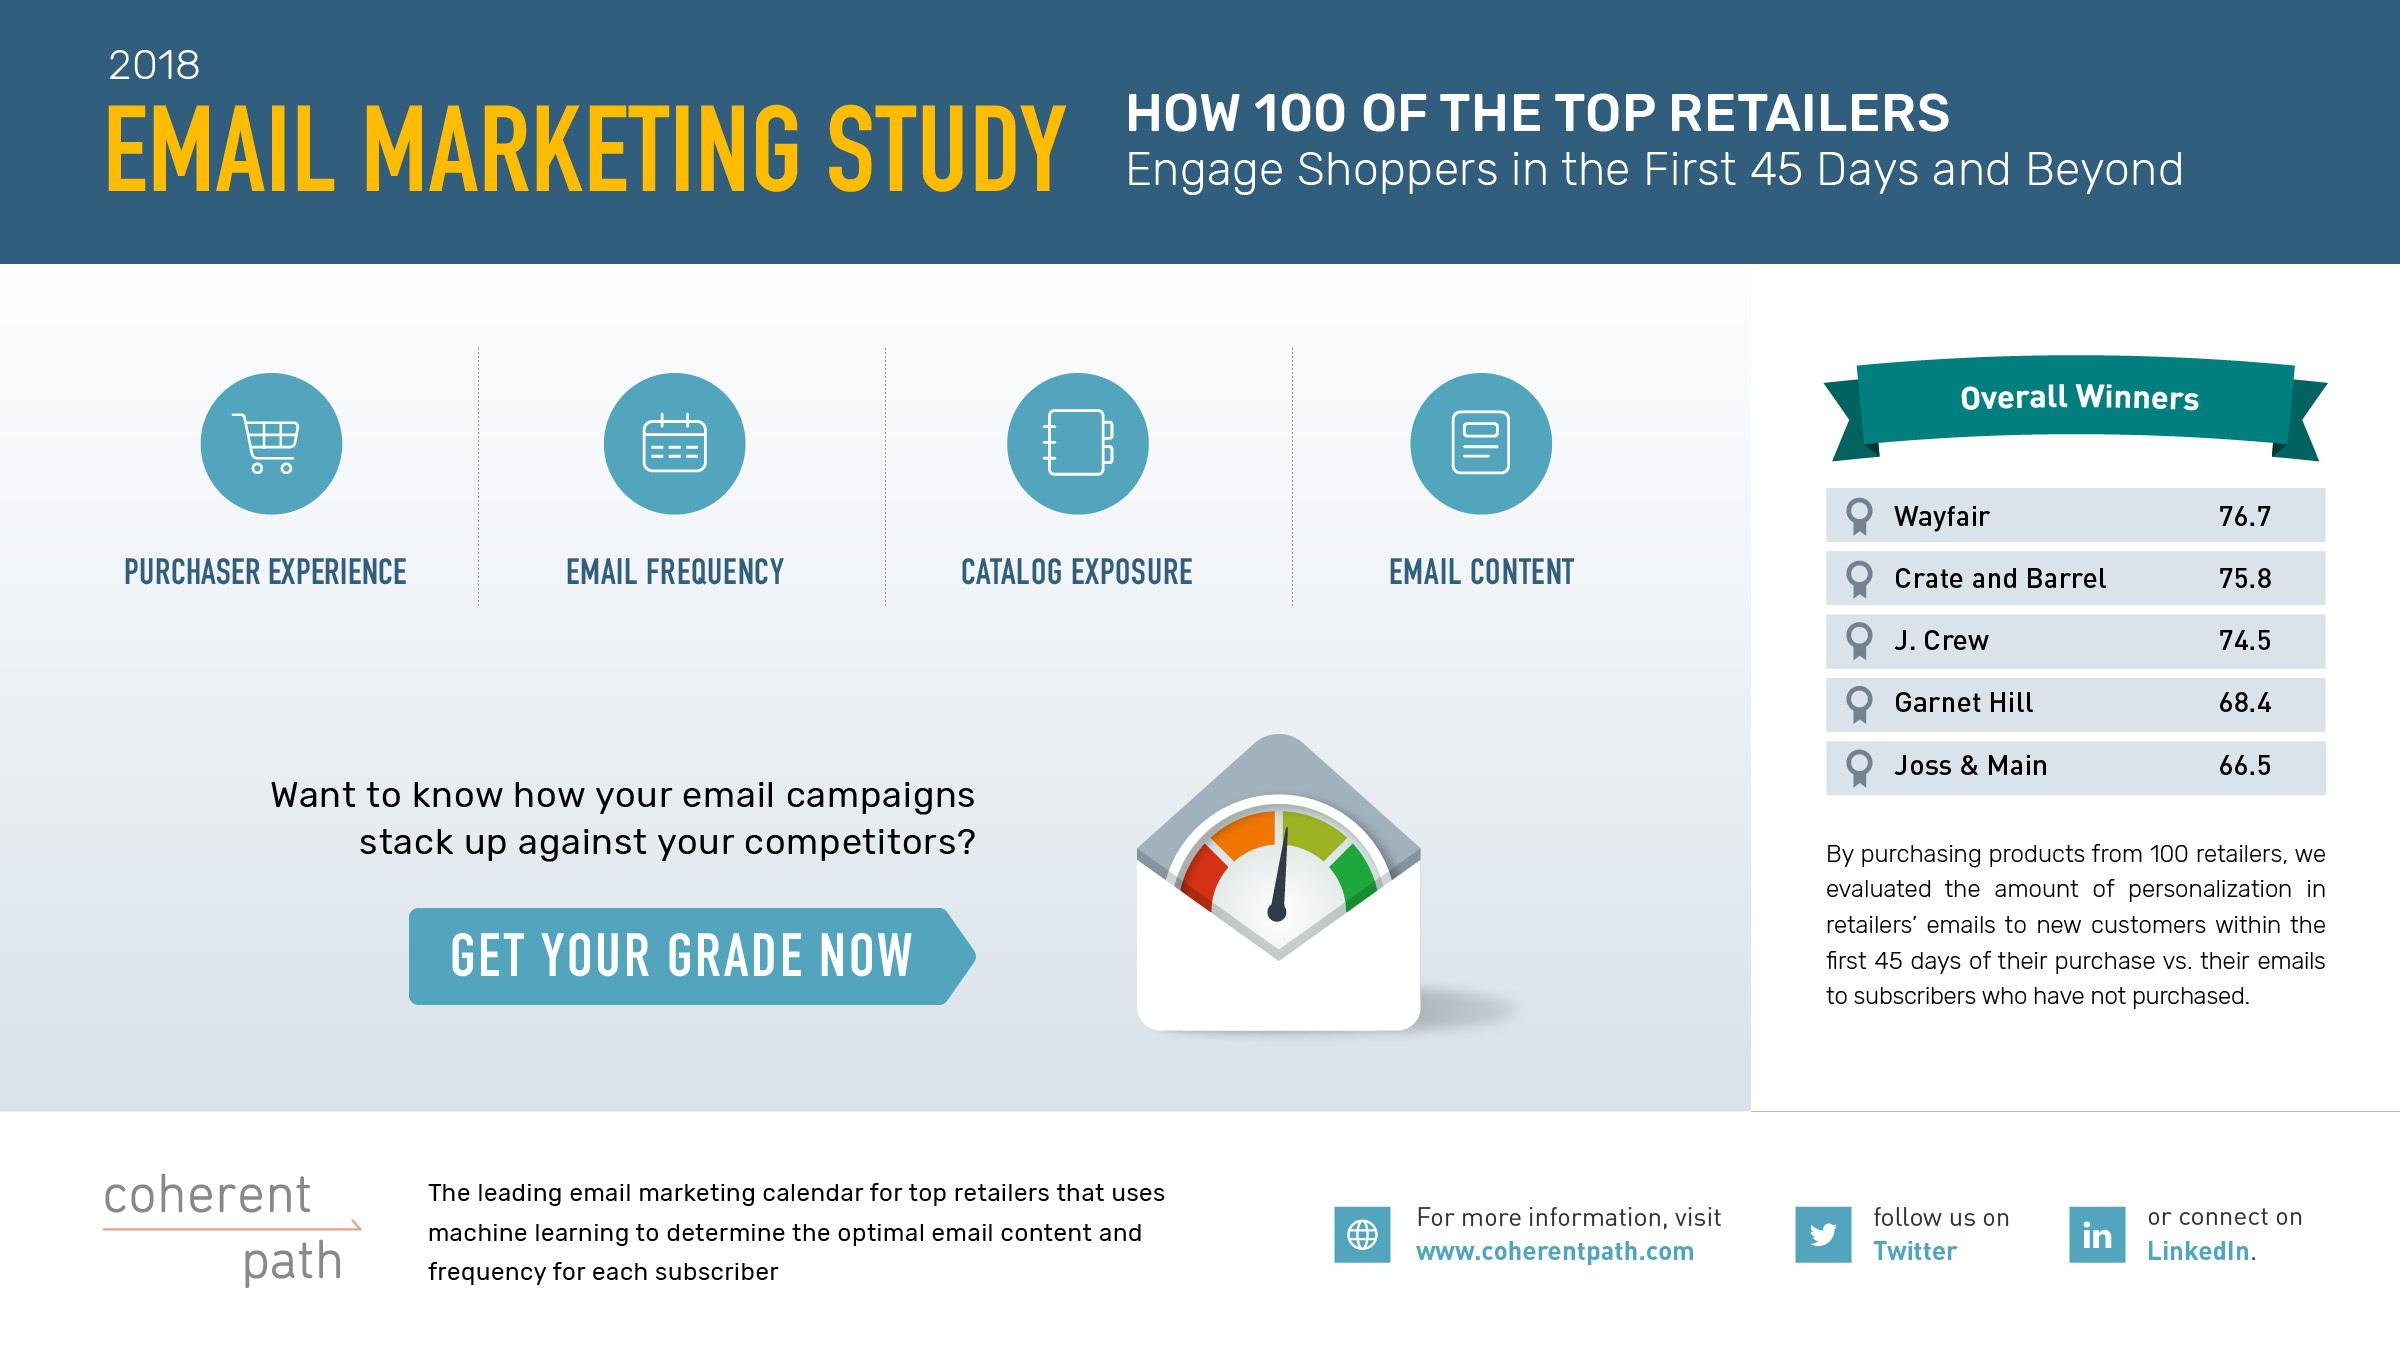 Wayfair Earns Top Spot in Email Effectiveness Study